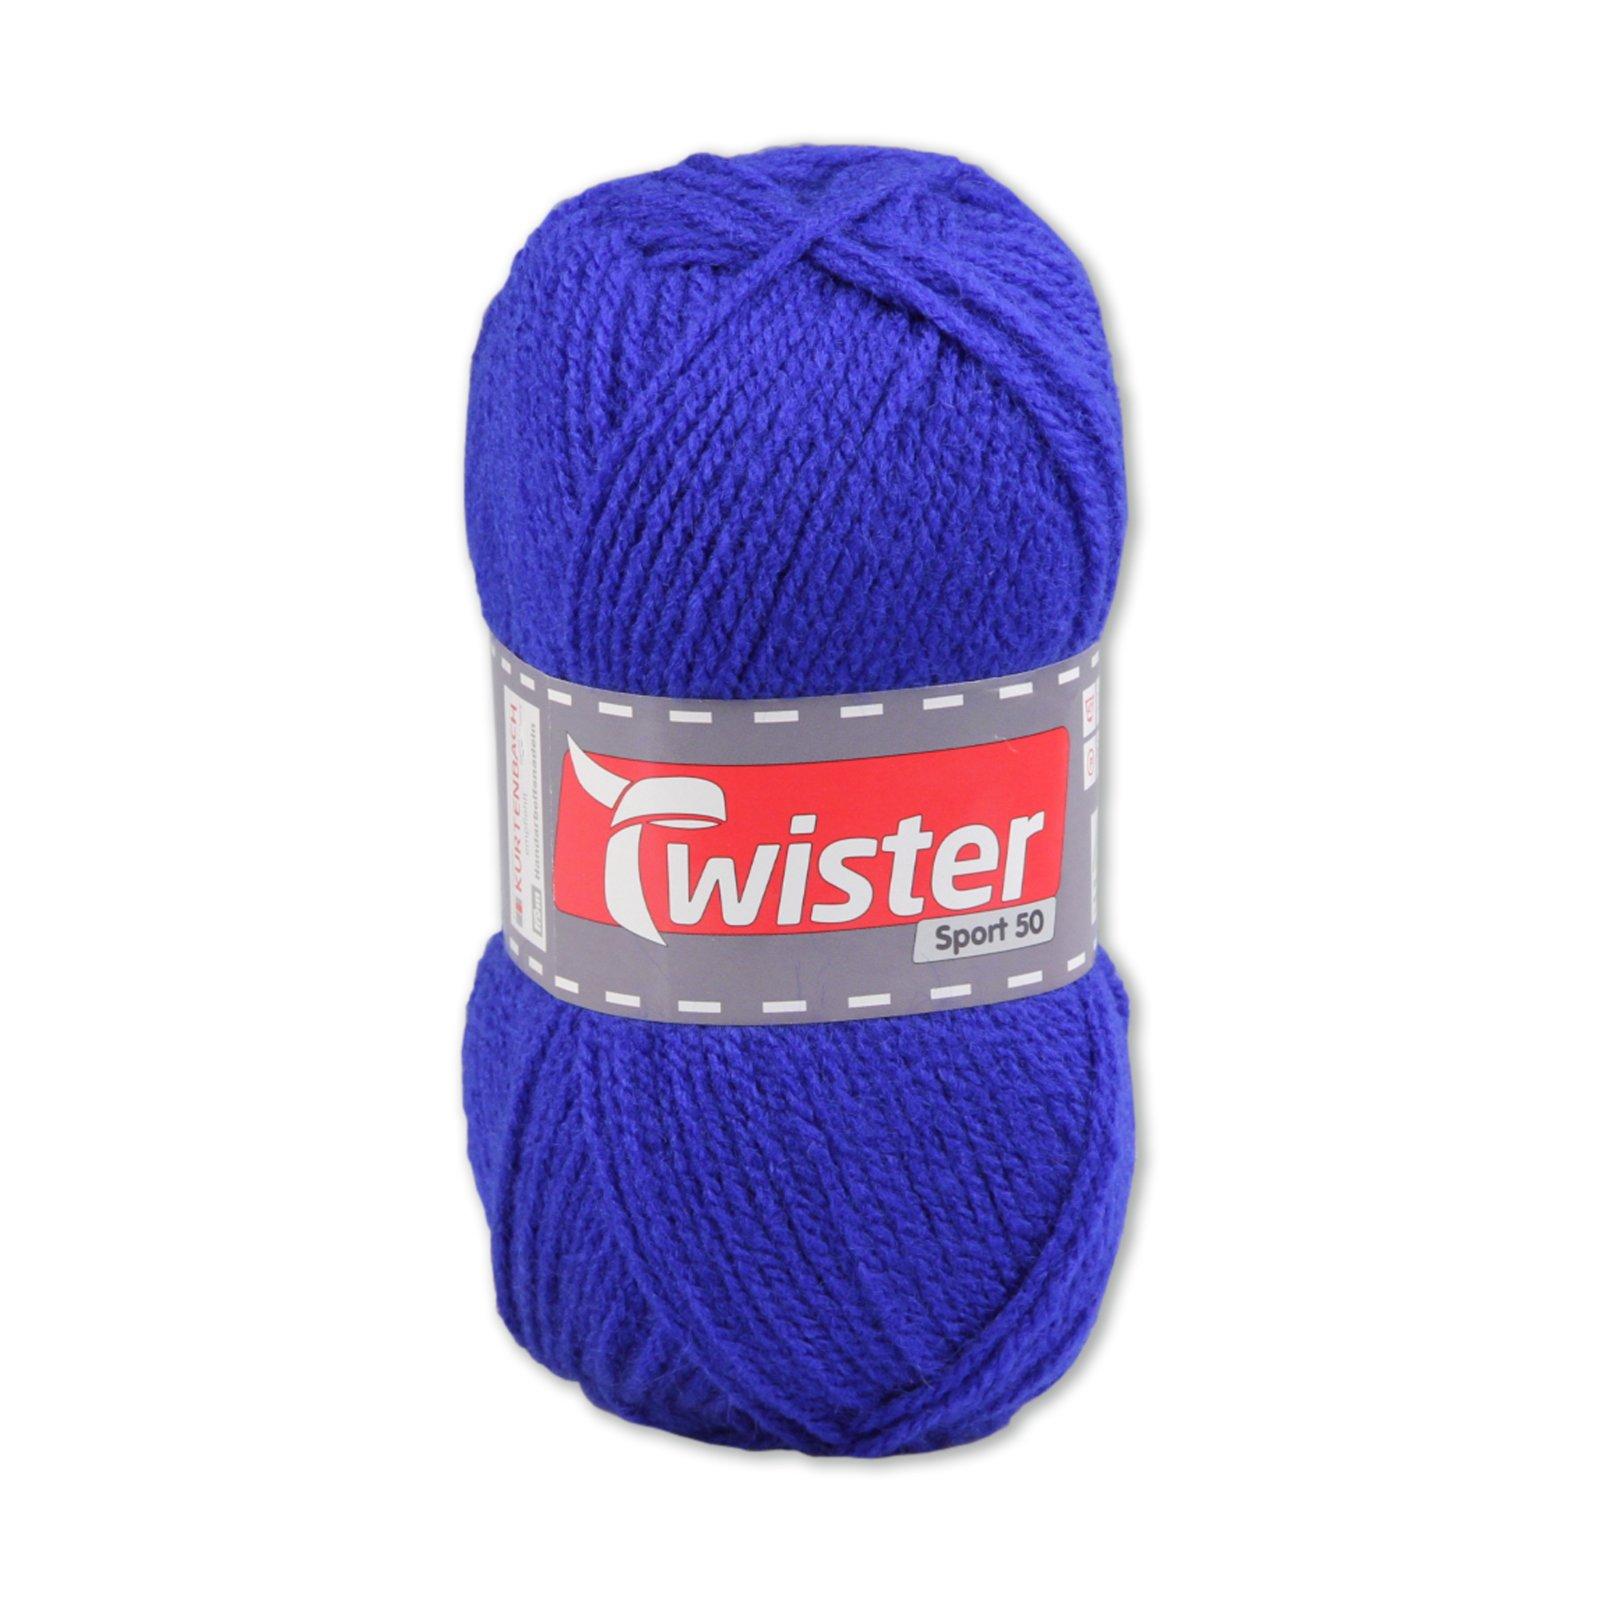 Wolle TWISTER SPORT UNI - royalblau - 50g